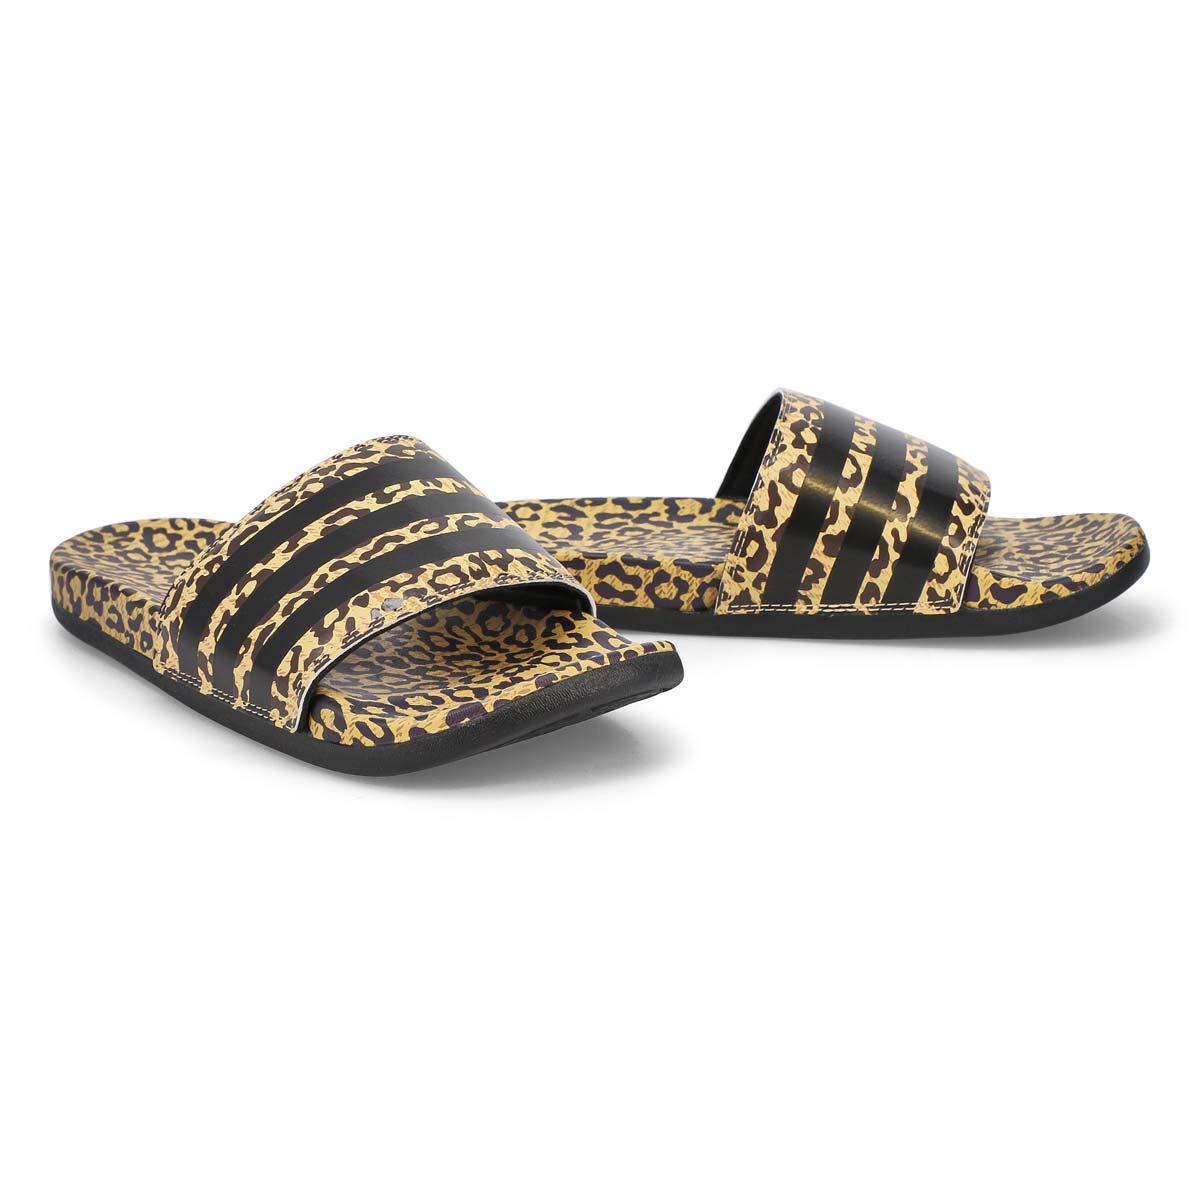 Women's Adilette CF+ Stripes W Slide - Black/Leo